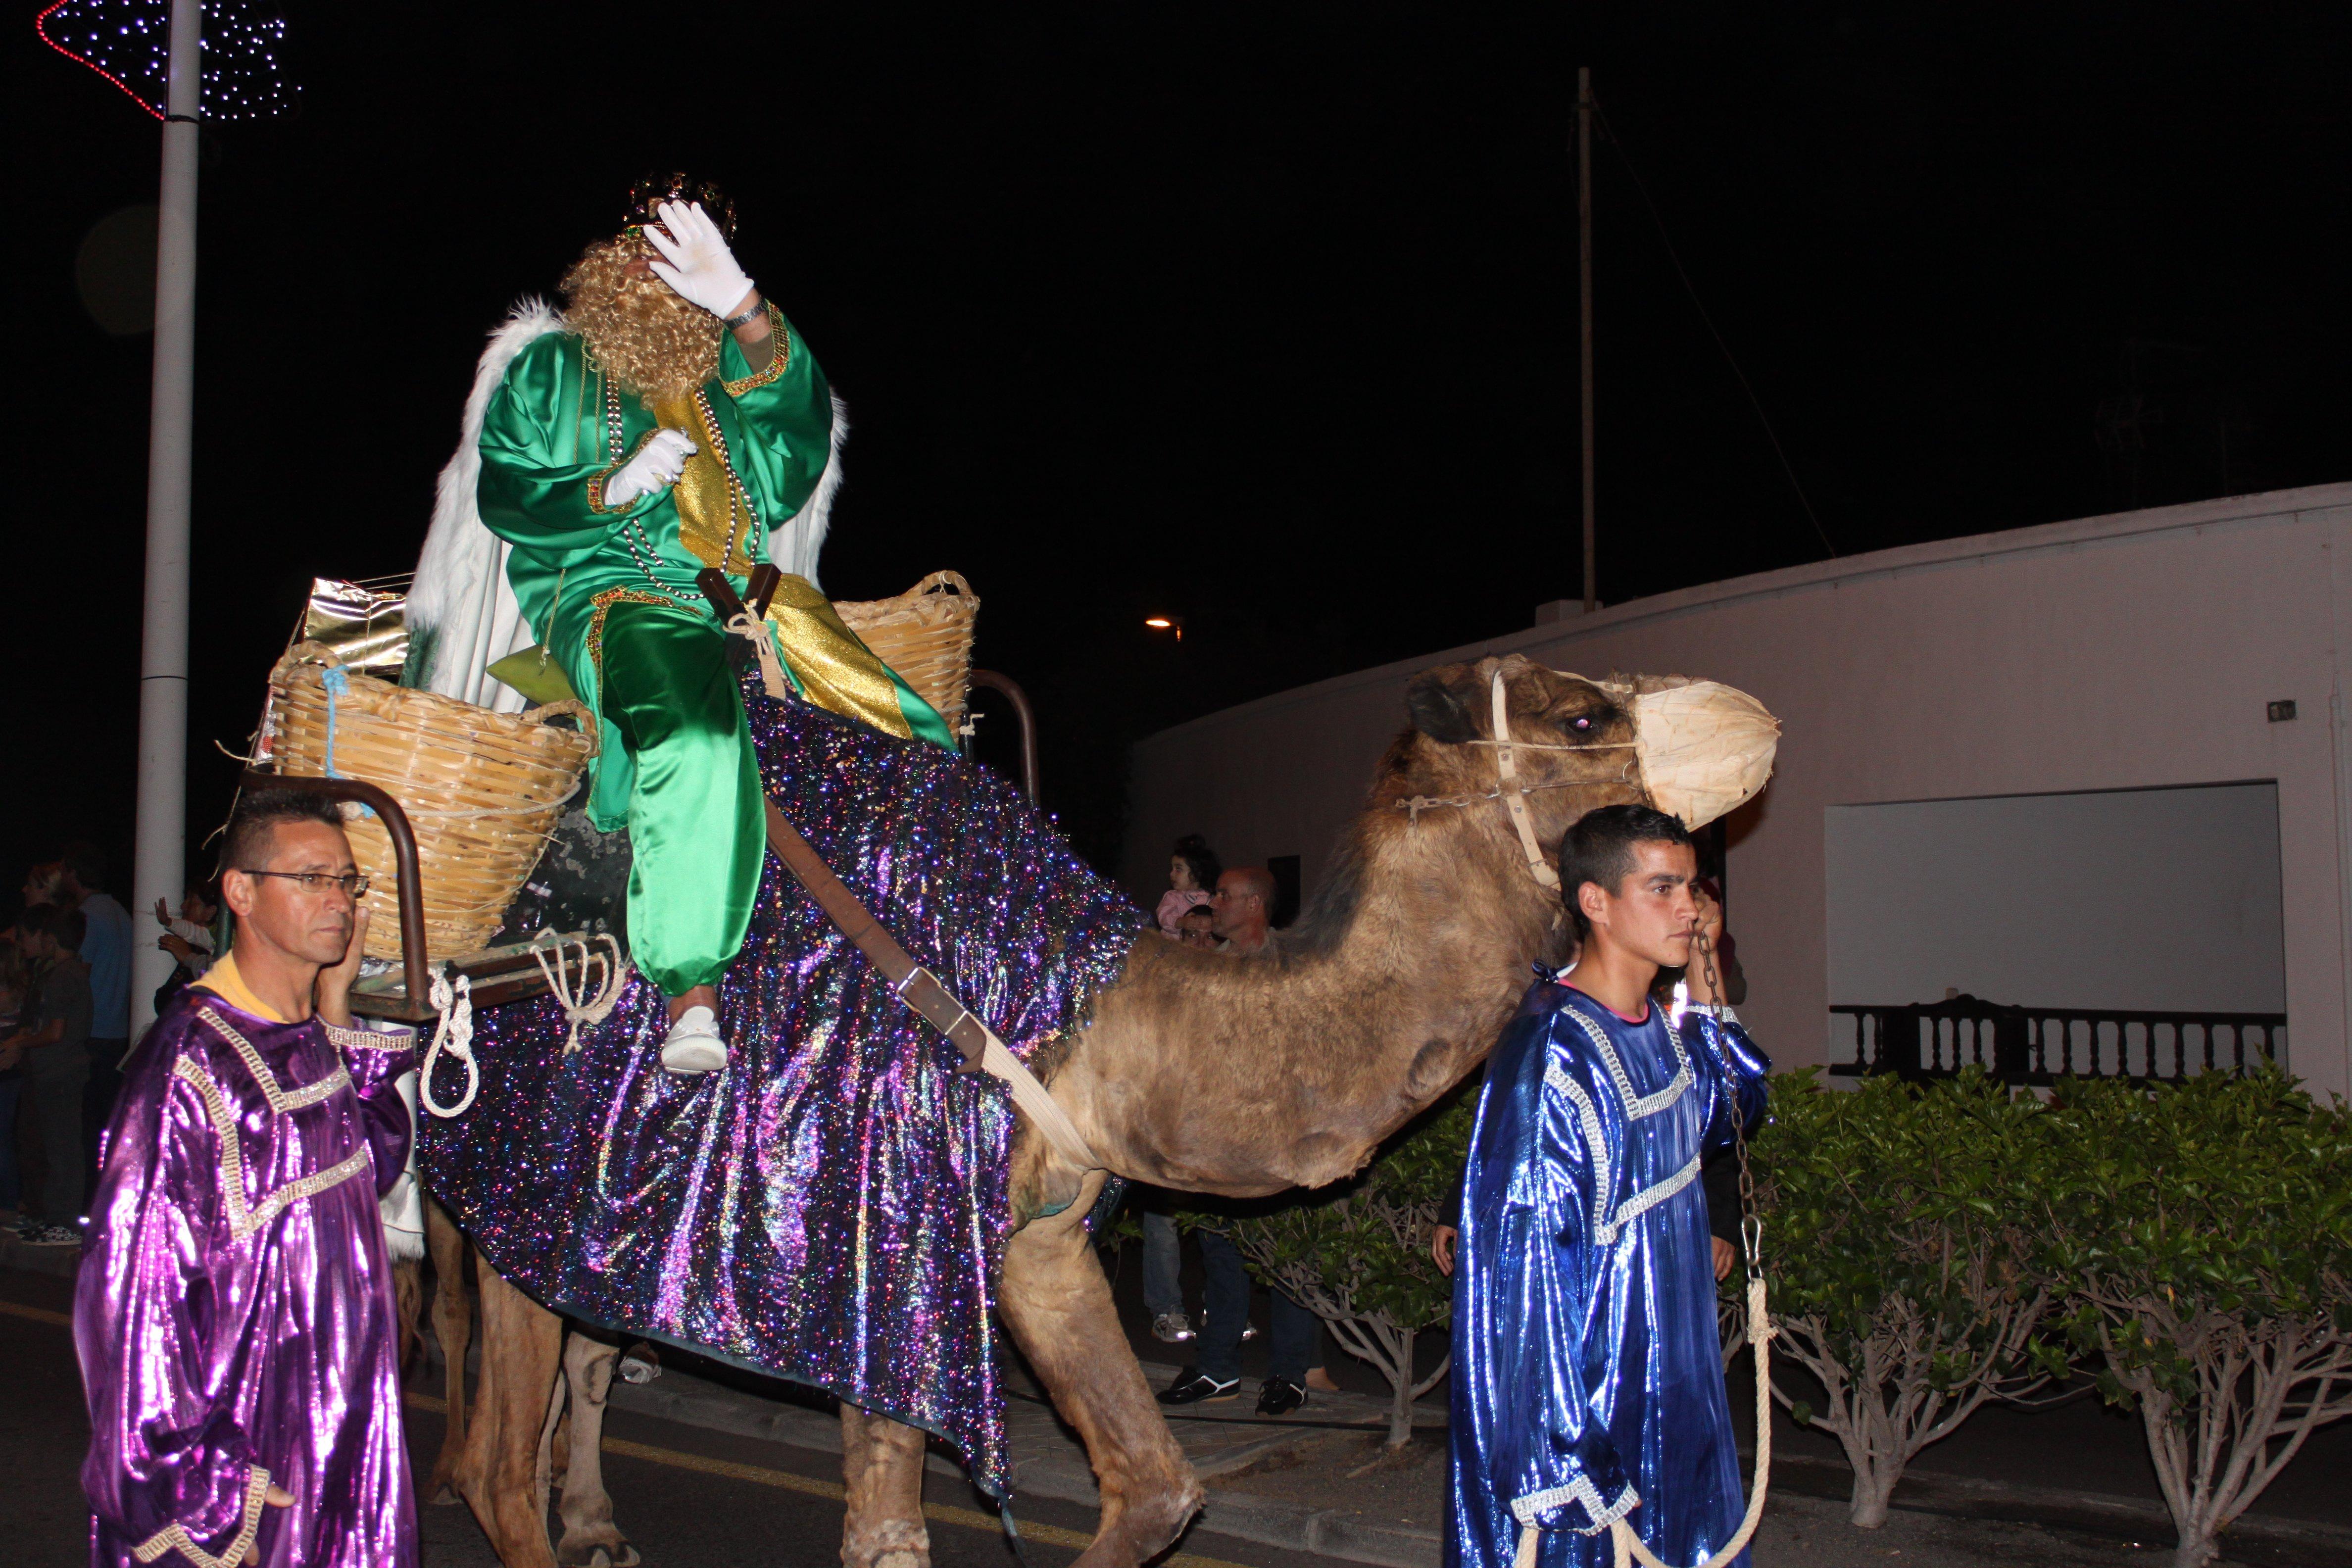 Heilige 3 Könige auf Kamel © KidsAway